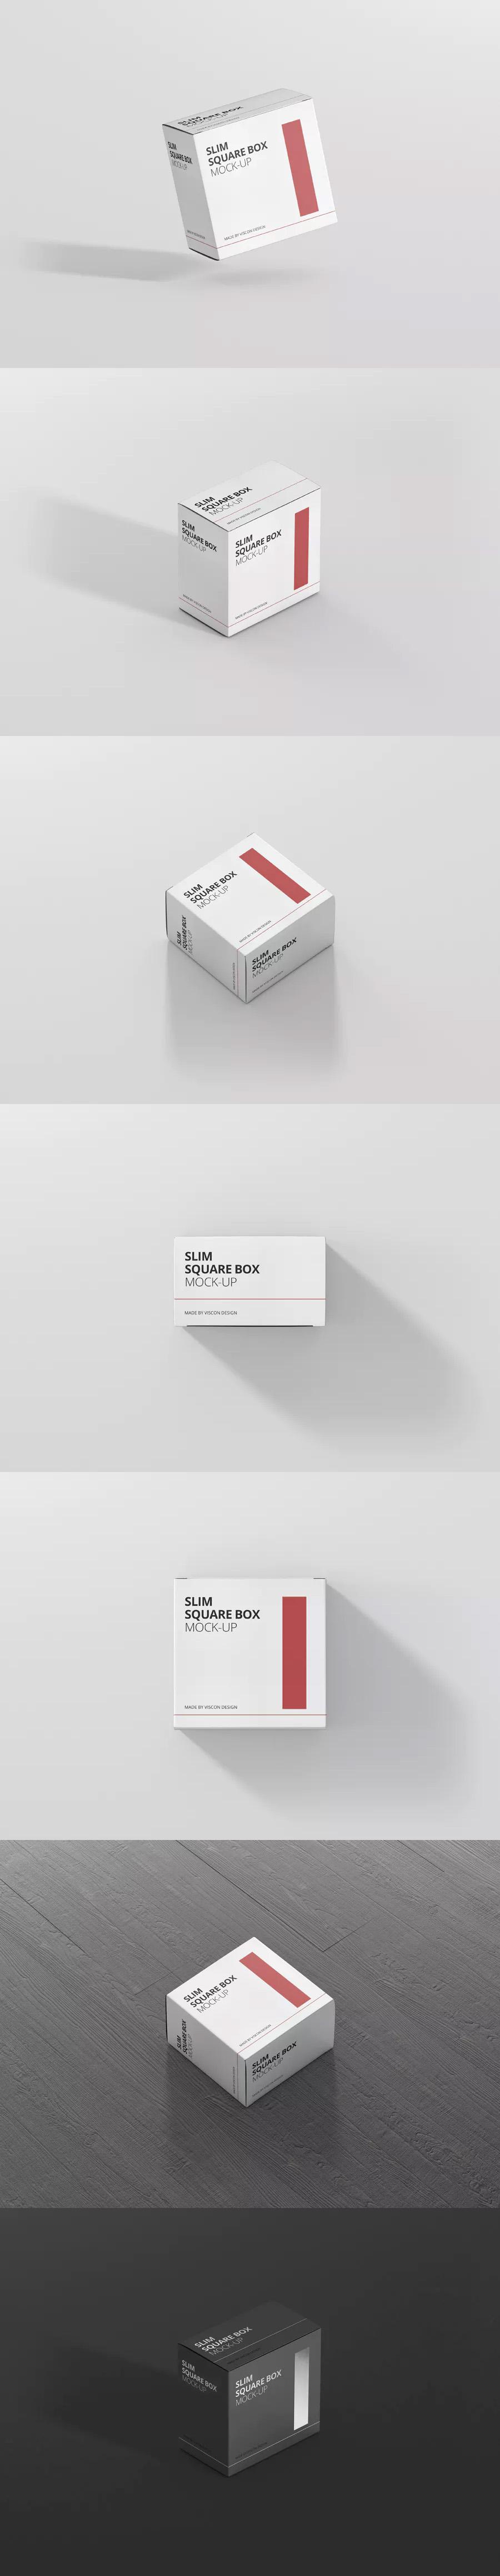 Download Package Box Mockup Slim Square By Visconbiz On Envato Elements Box Mockup Box Packaging Mockup